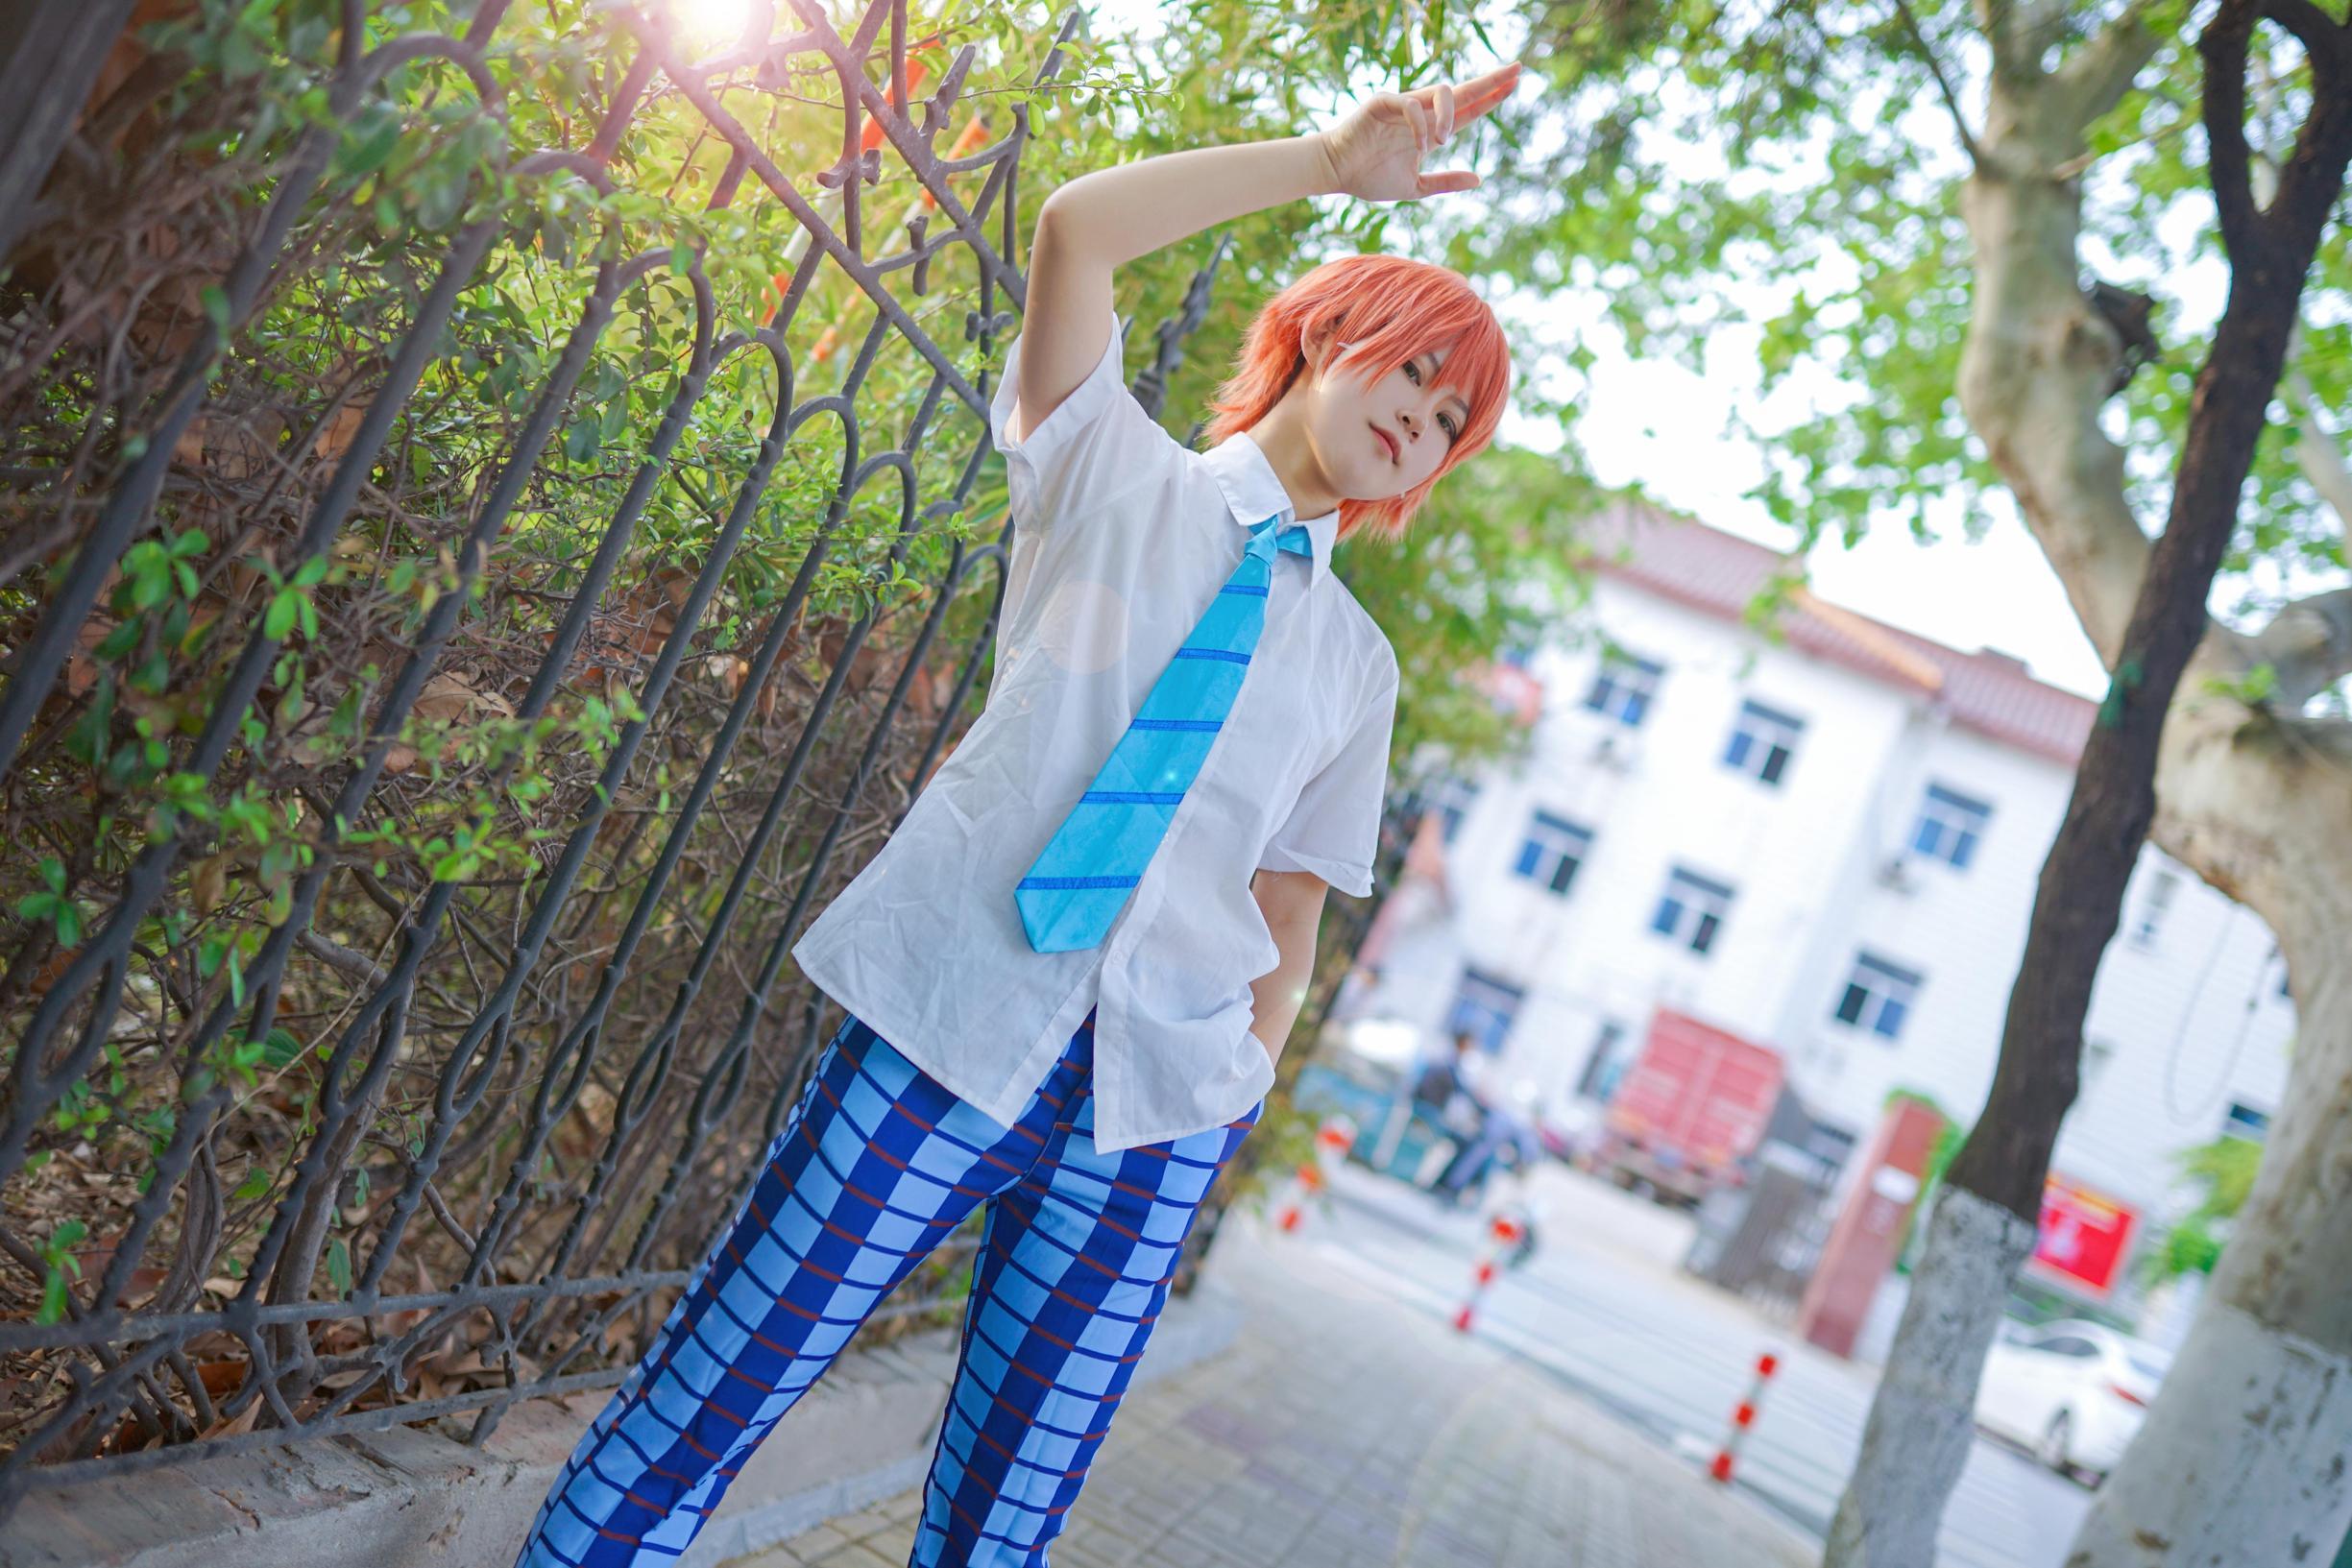 《LOVE LIVE!》正片cosplay【CN:_李笑颜Lee】-第8张